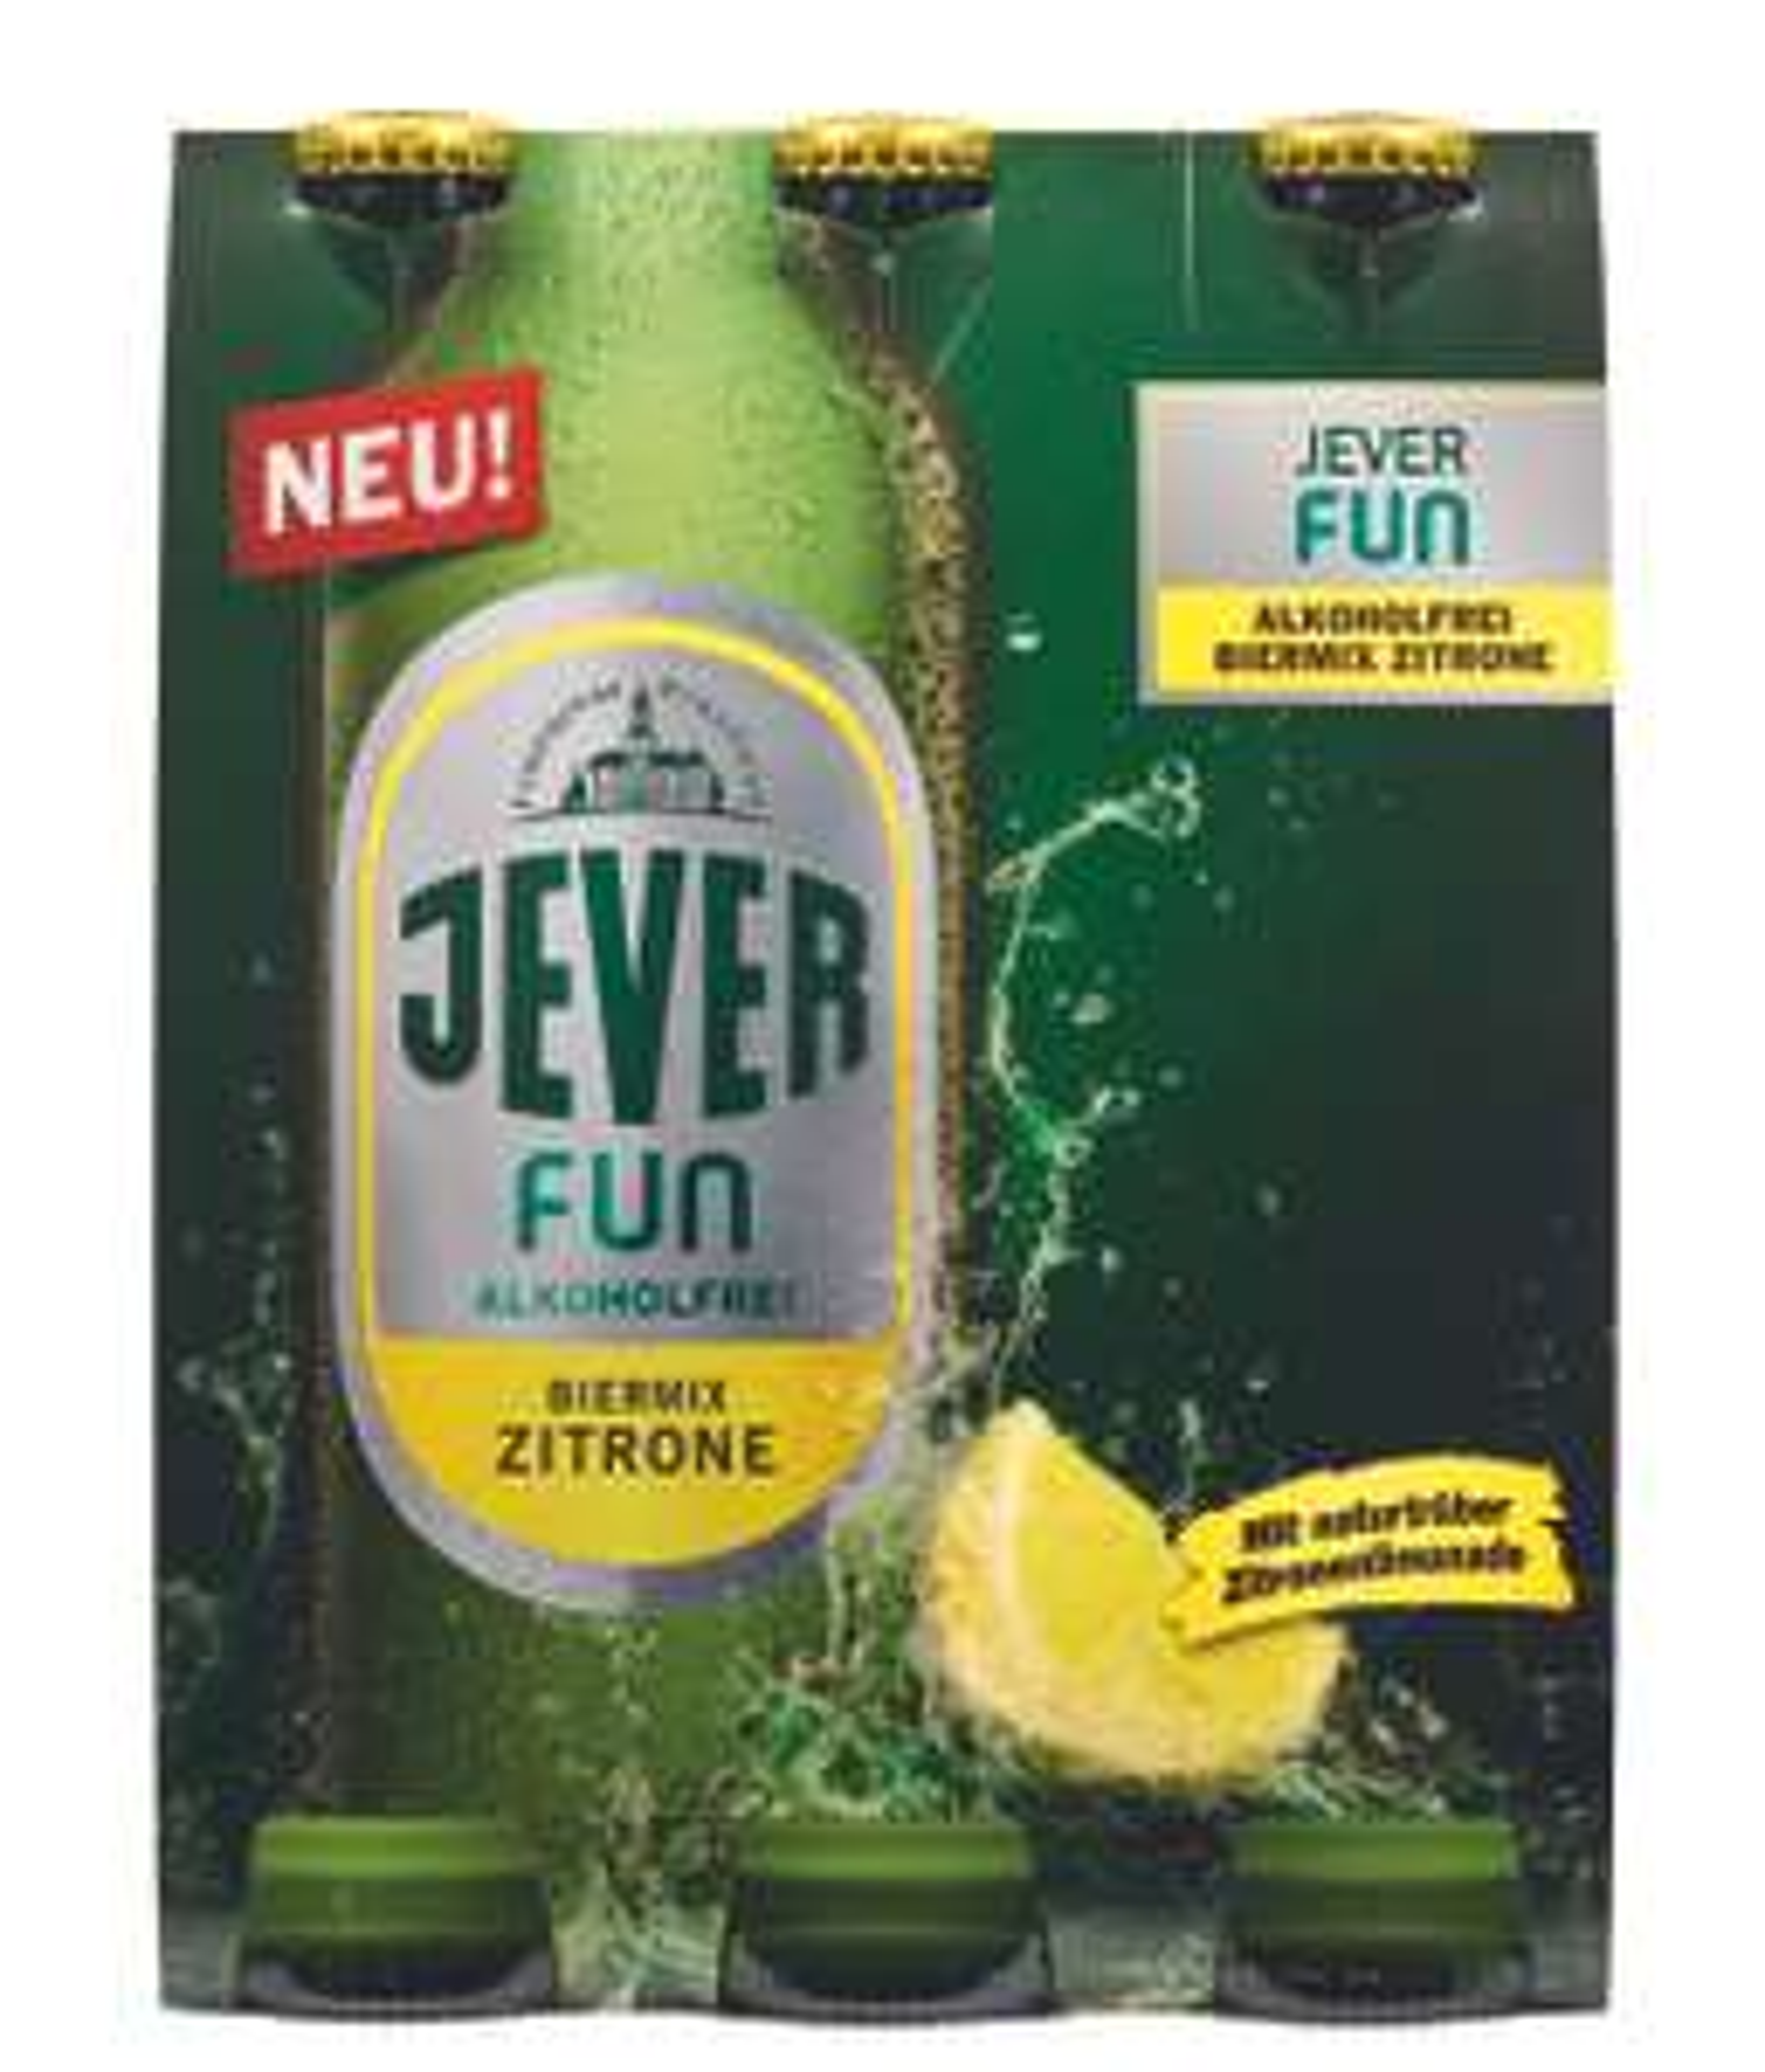 Sixpack Jever Fun Zitrone für 1,70€ bei Kaufland [Coupon]